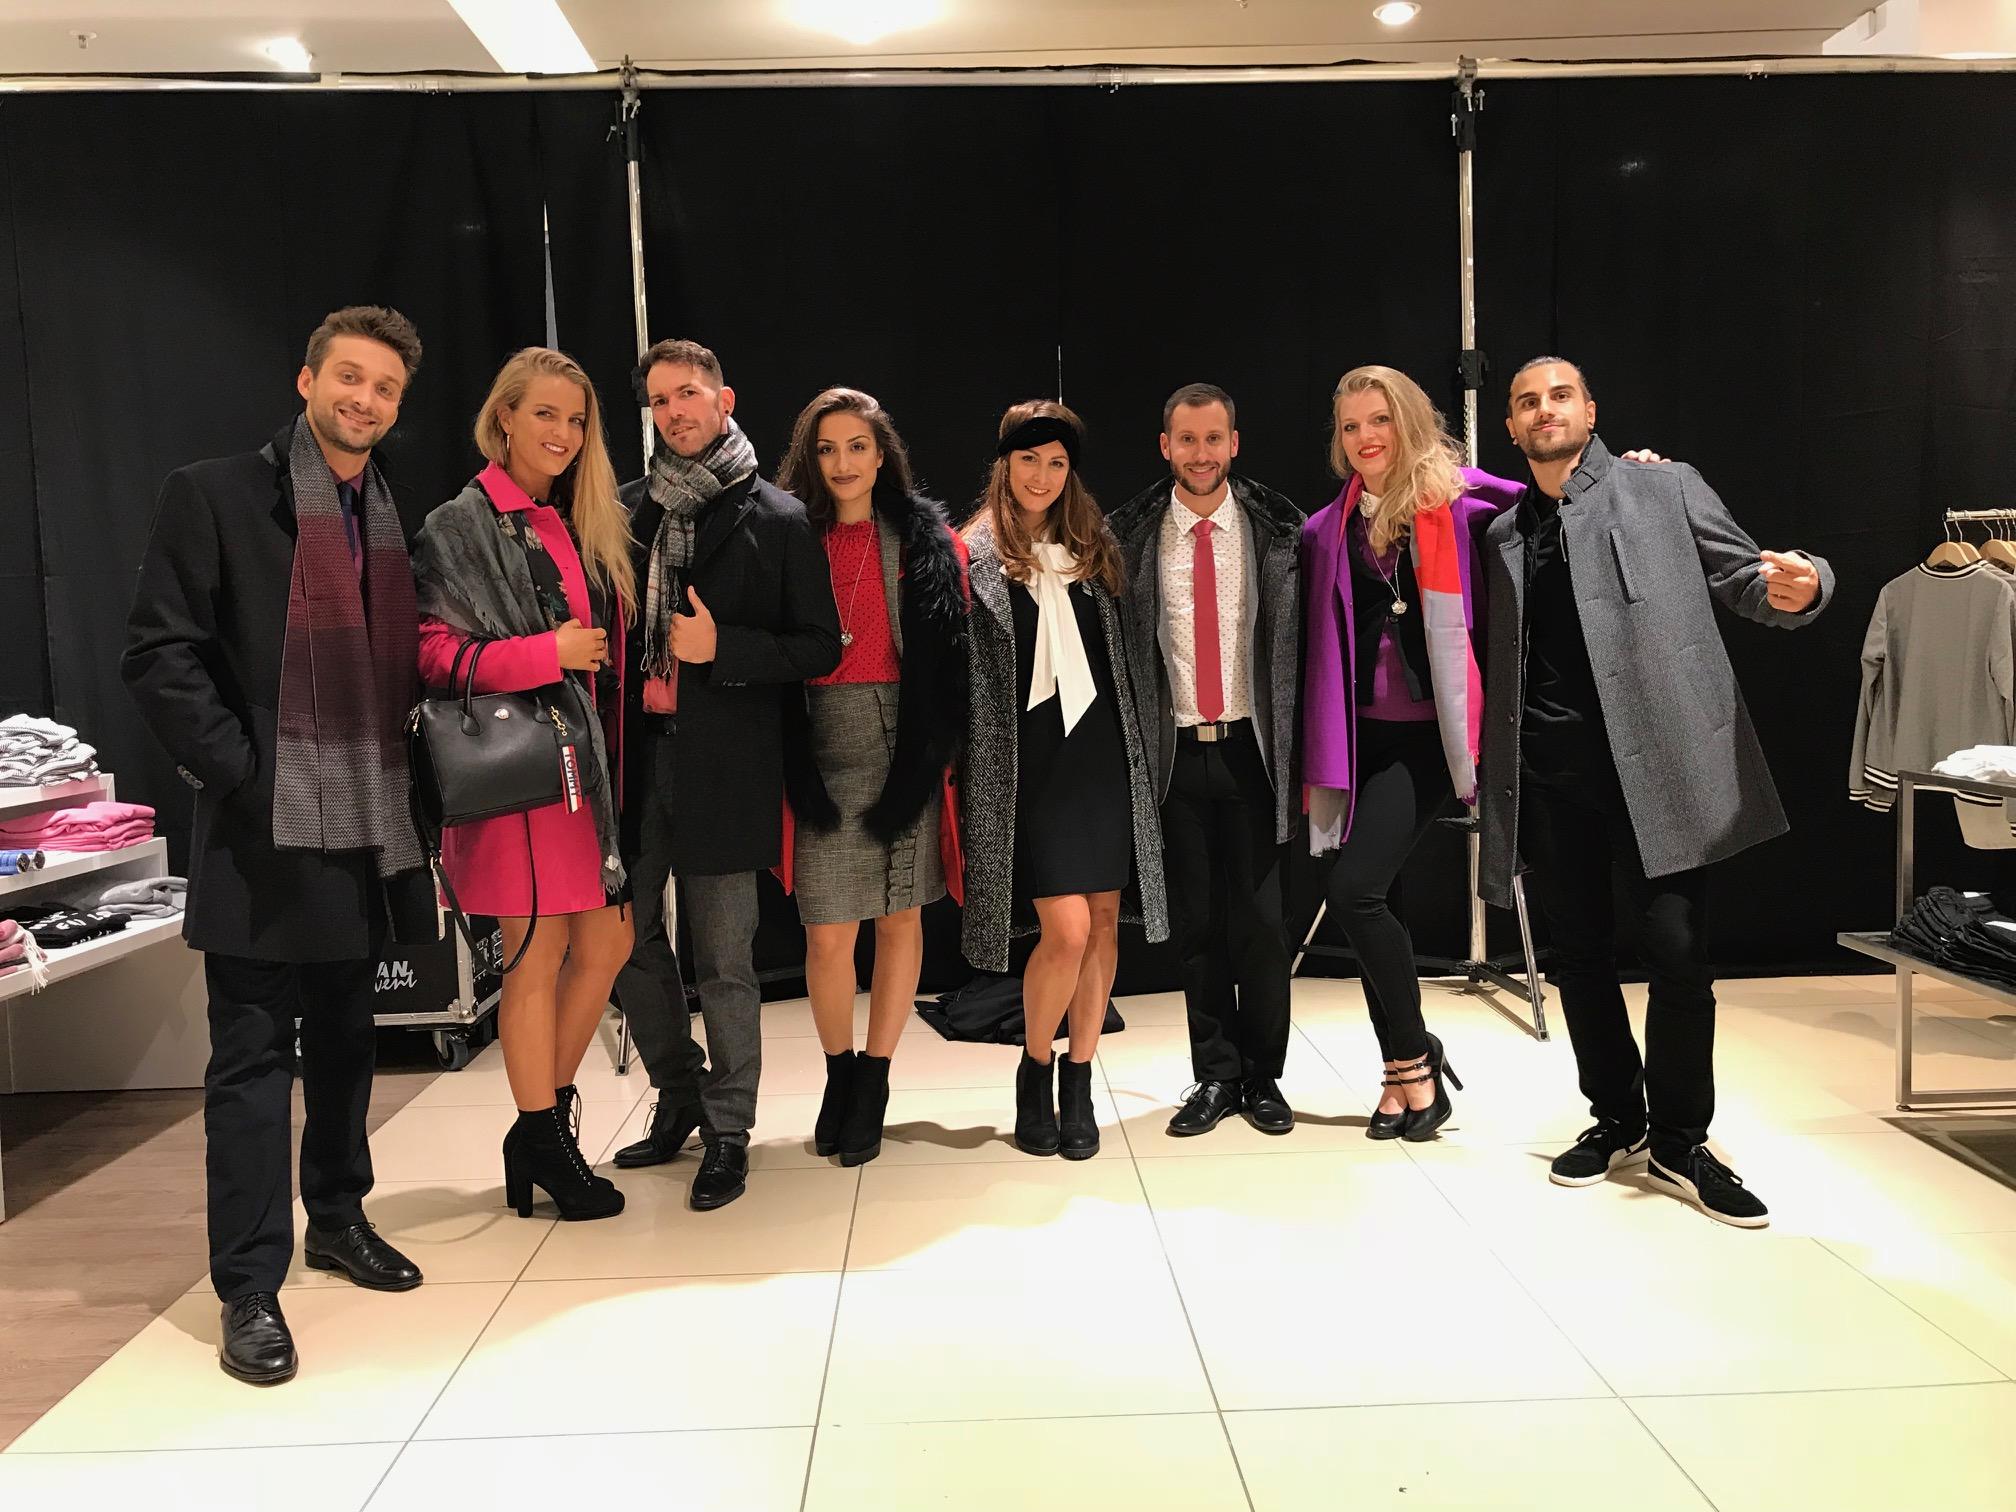 Models, Fashion Show, Choreografie